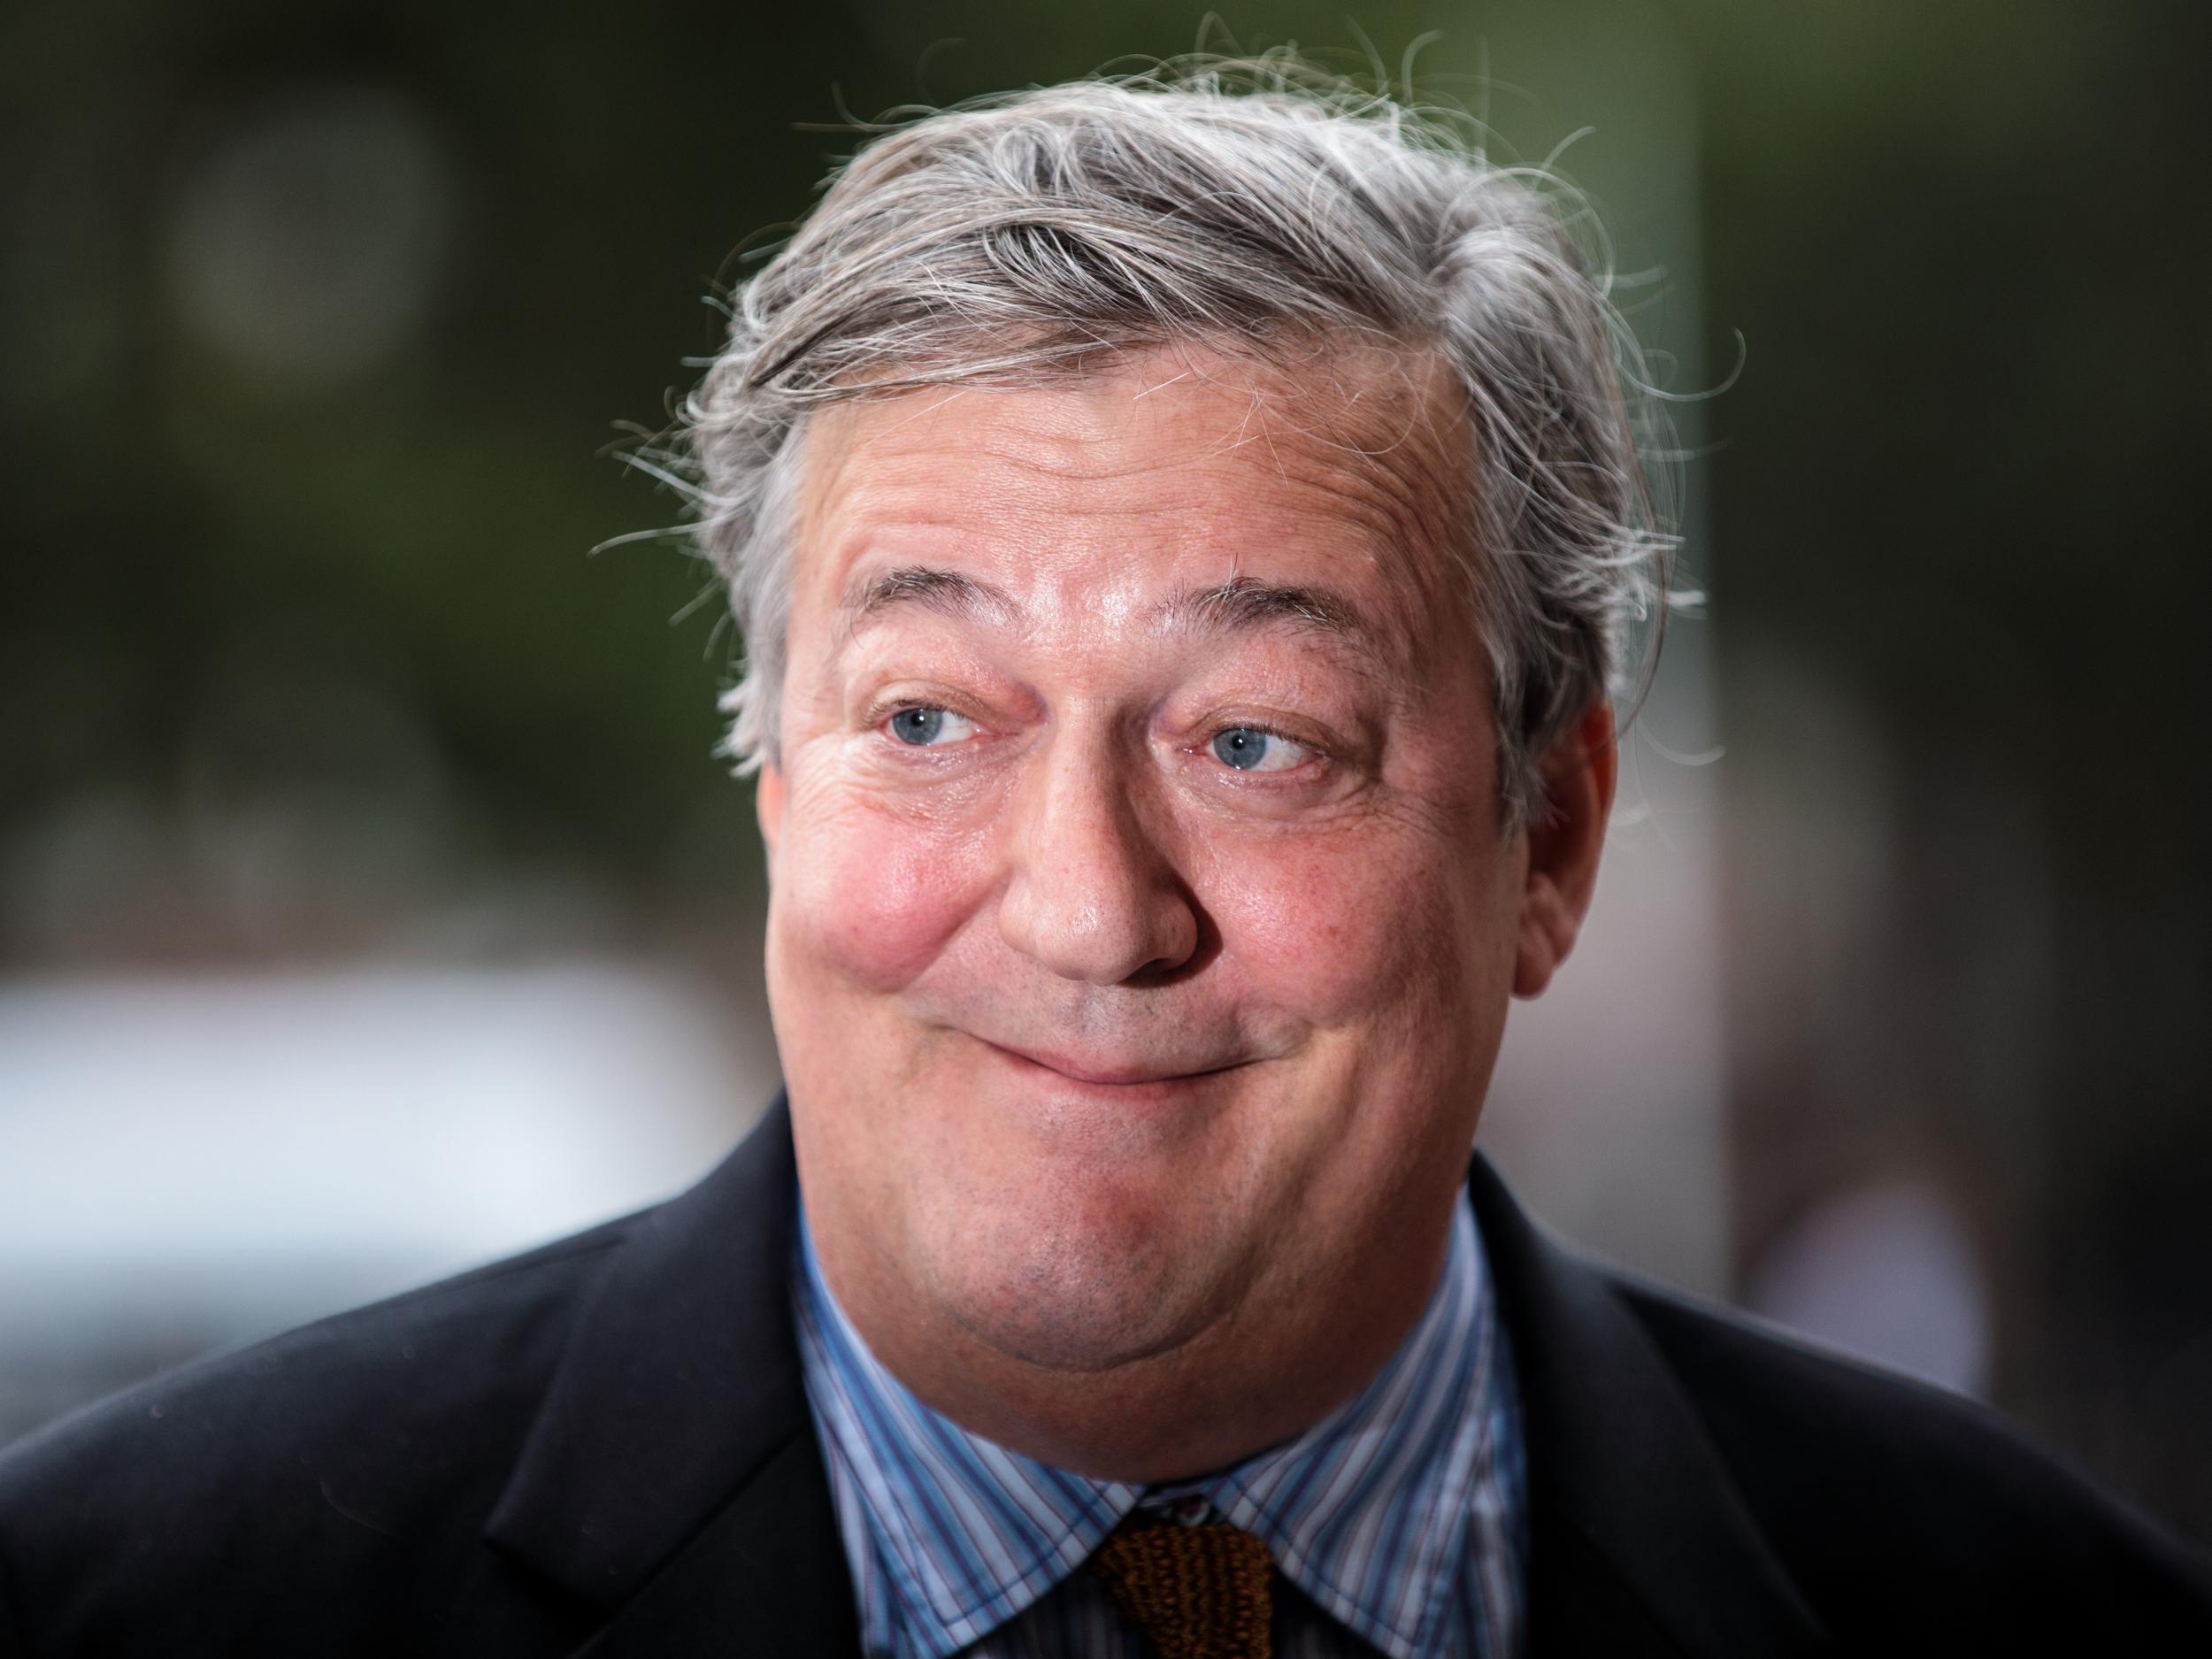 12. Stephen Fry